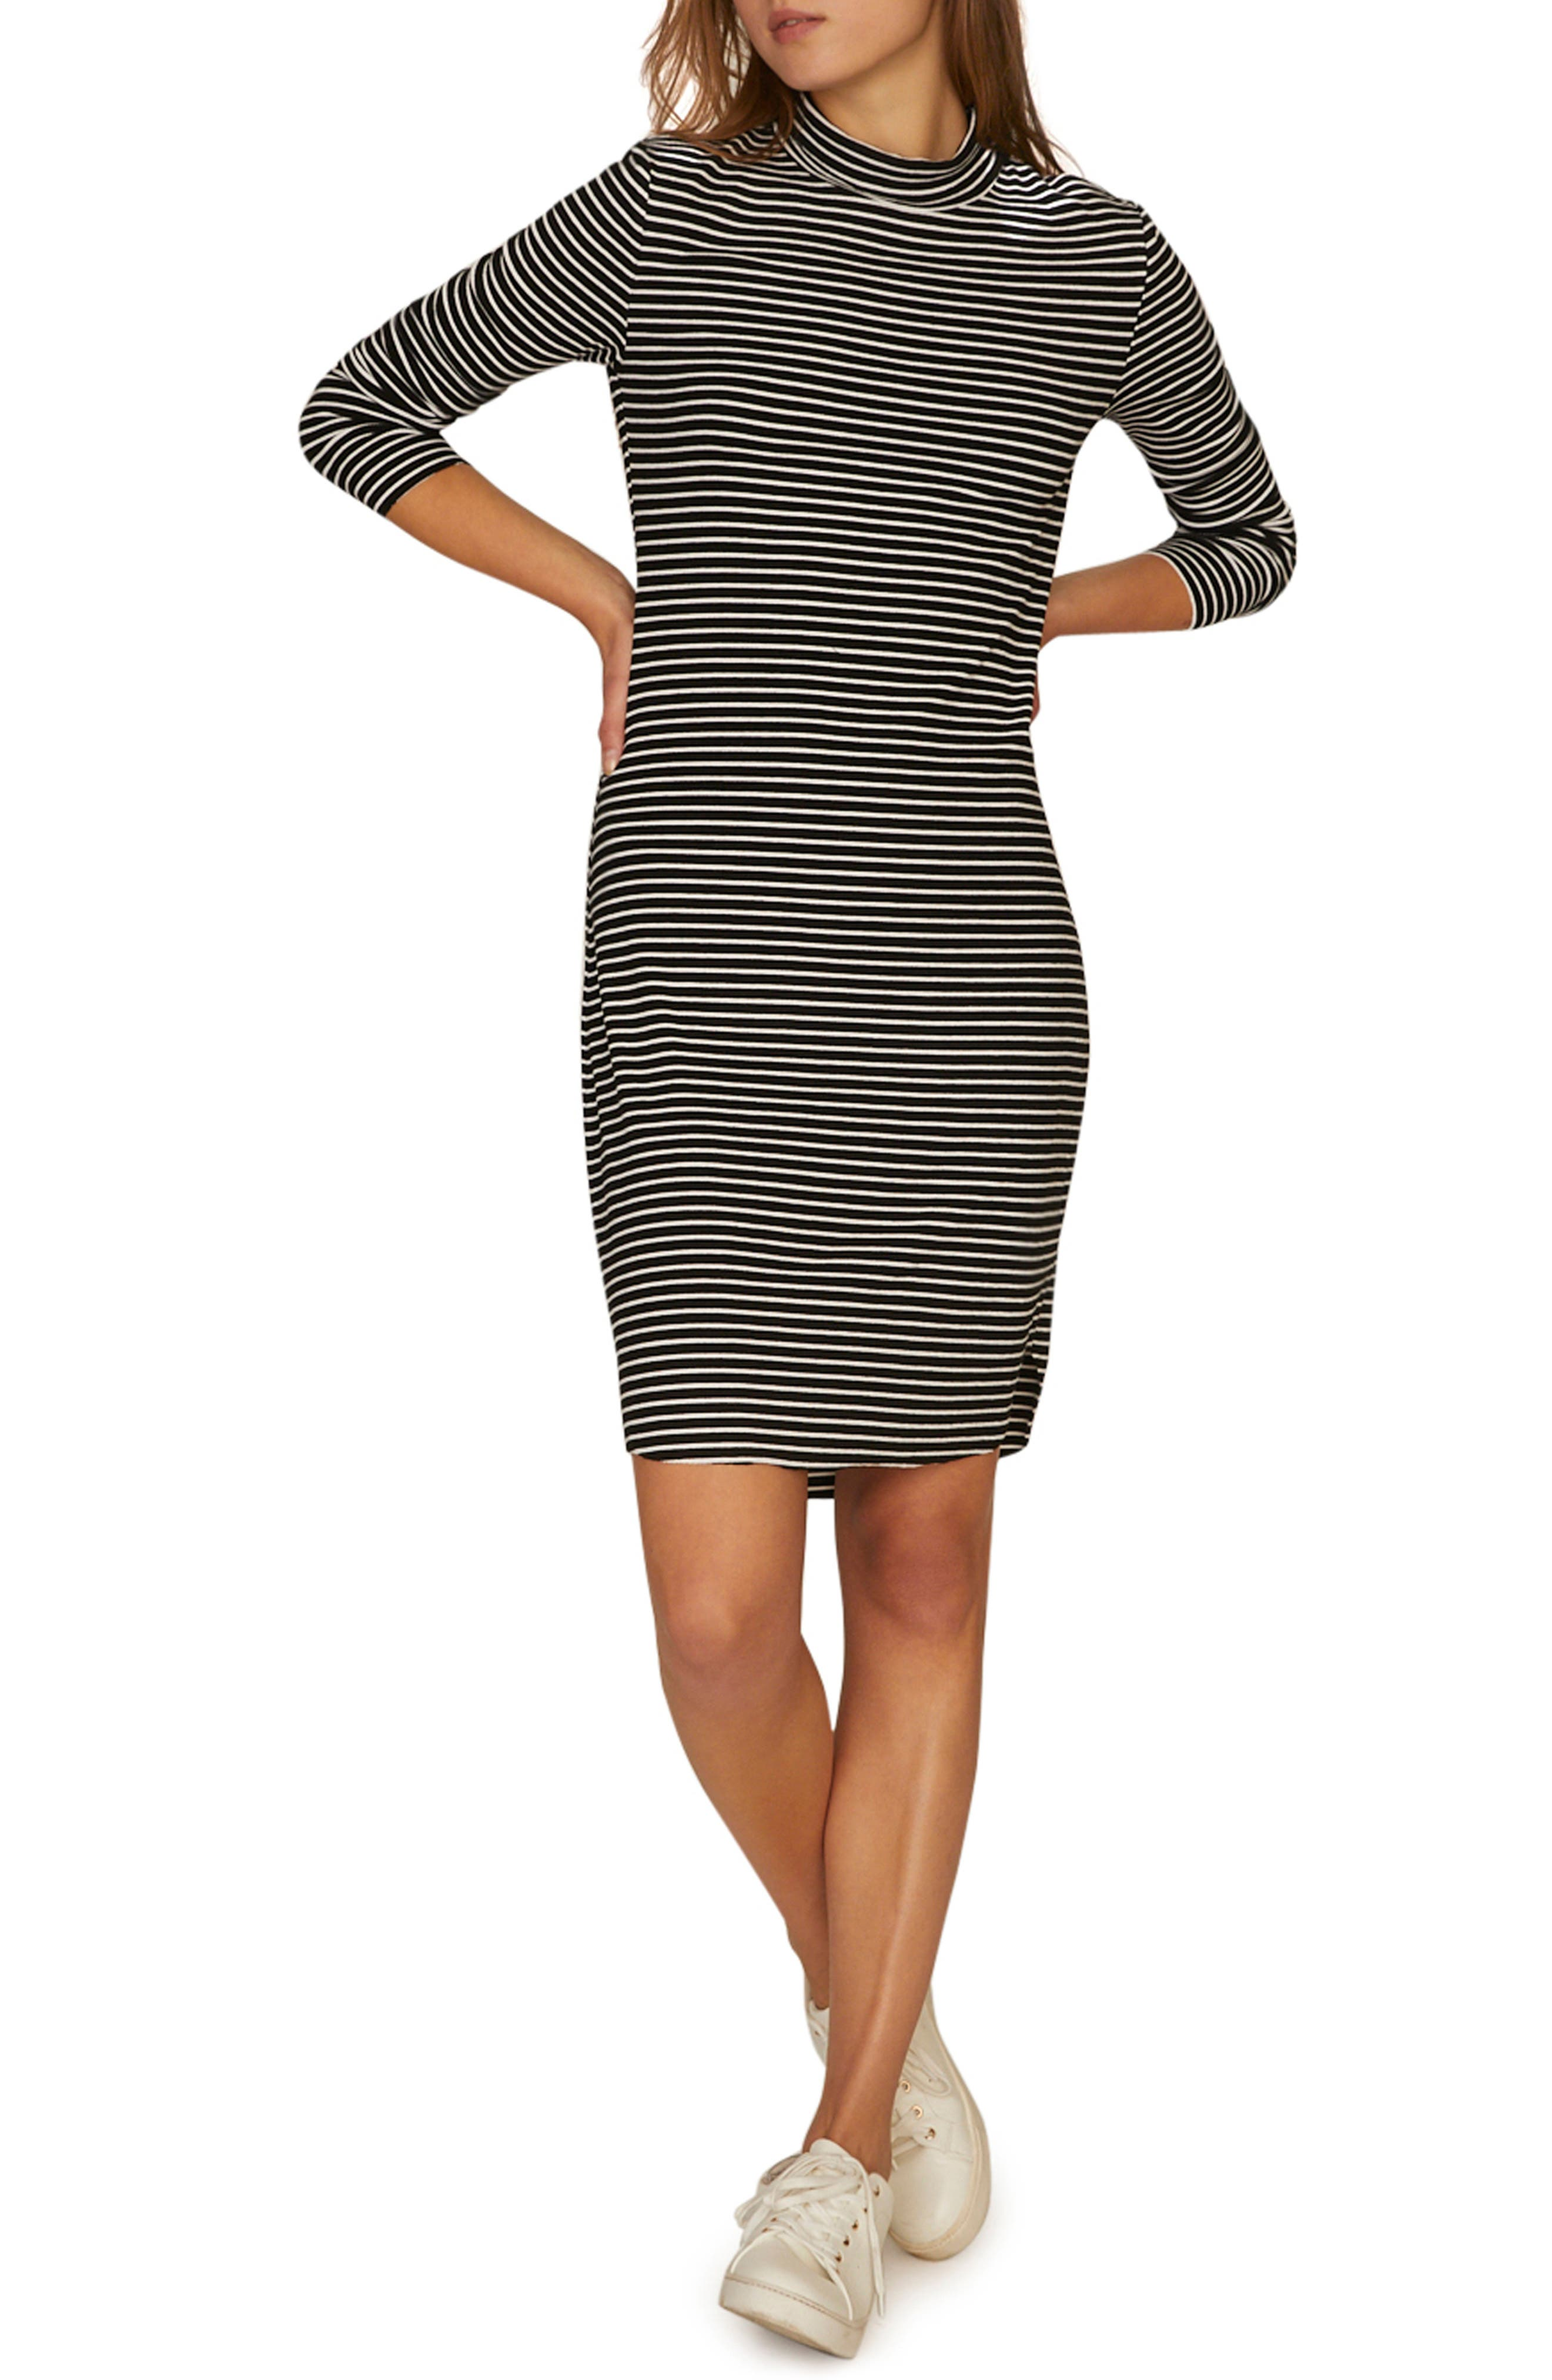 SANCTUARY Essentials Stripe Mock Neck Dress, Main, color, CLASSIC STRIPE BLACK